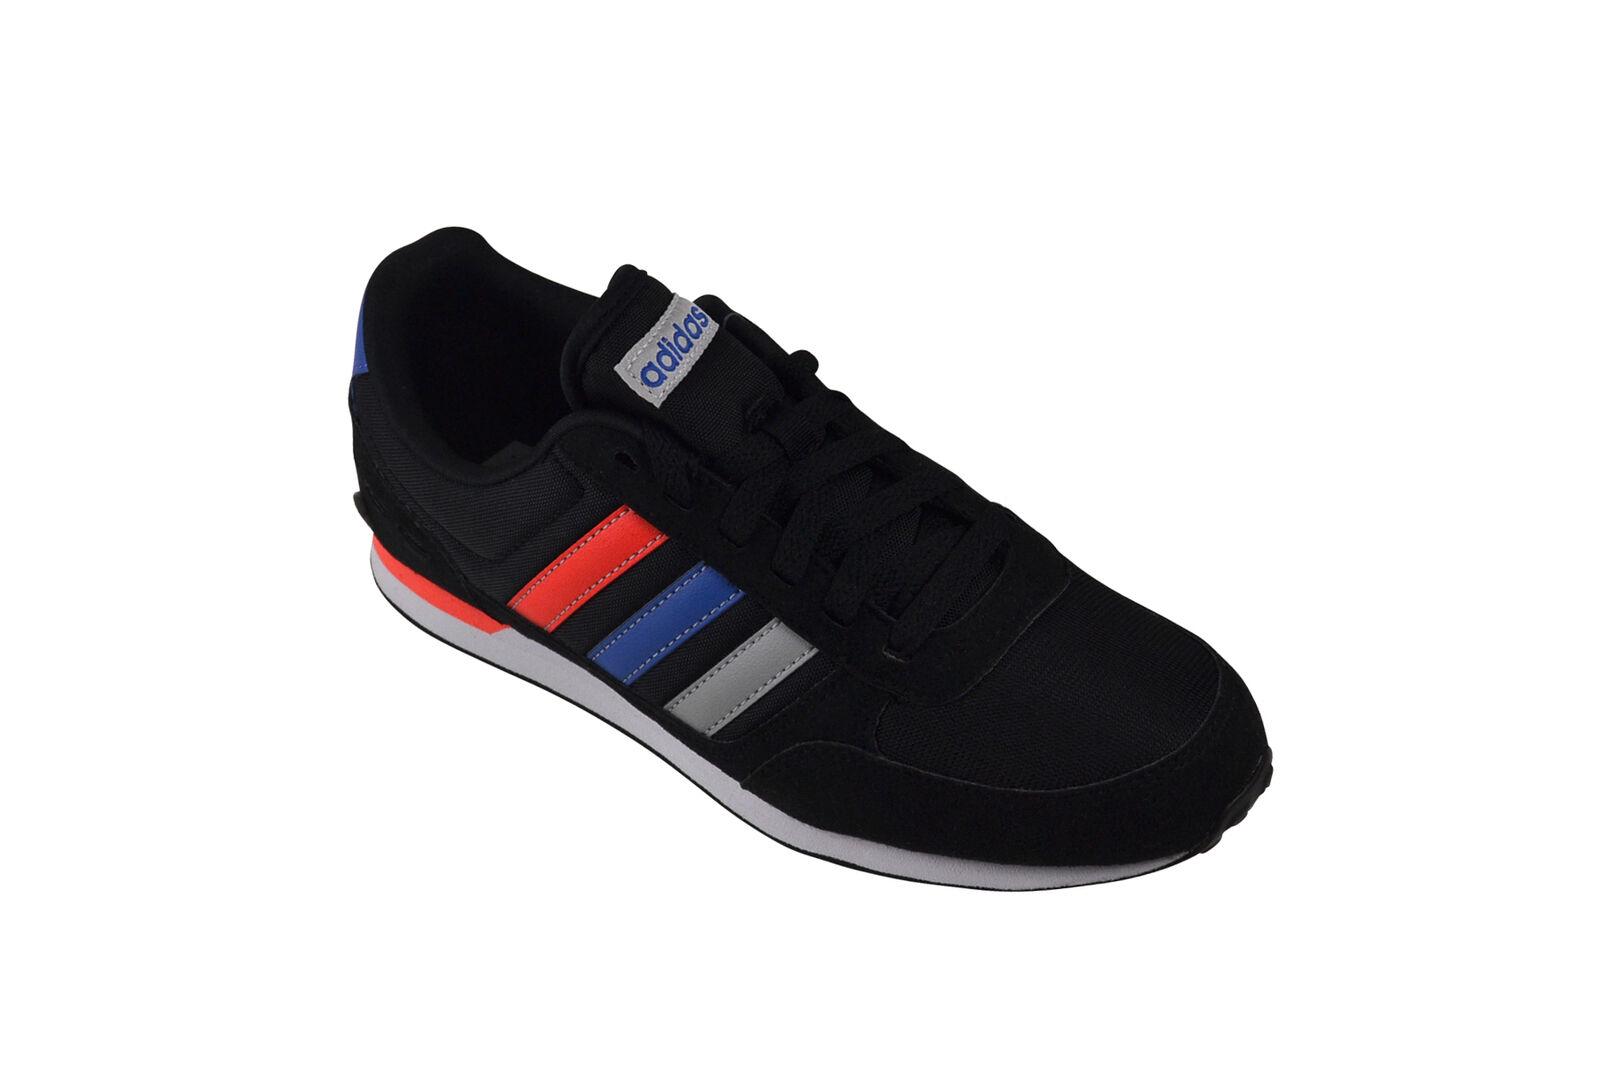 Adidas Neo schwarz City Racer black1/ligoni/infred Sneaker/Schuhe schwarz Neo F37933 093323